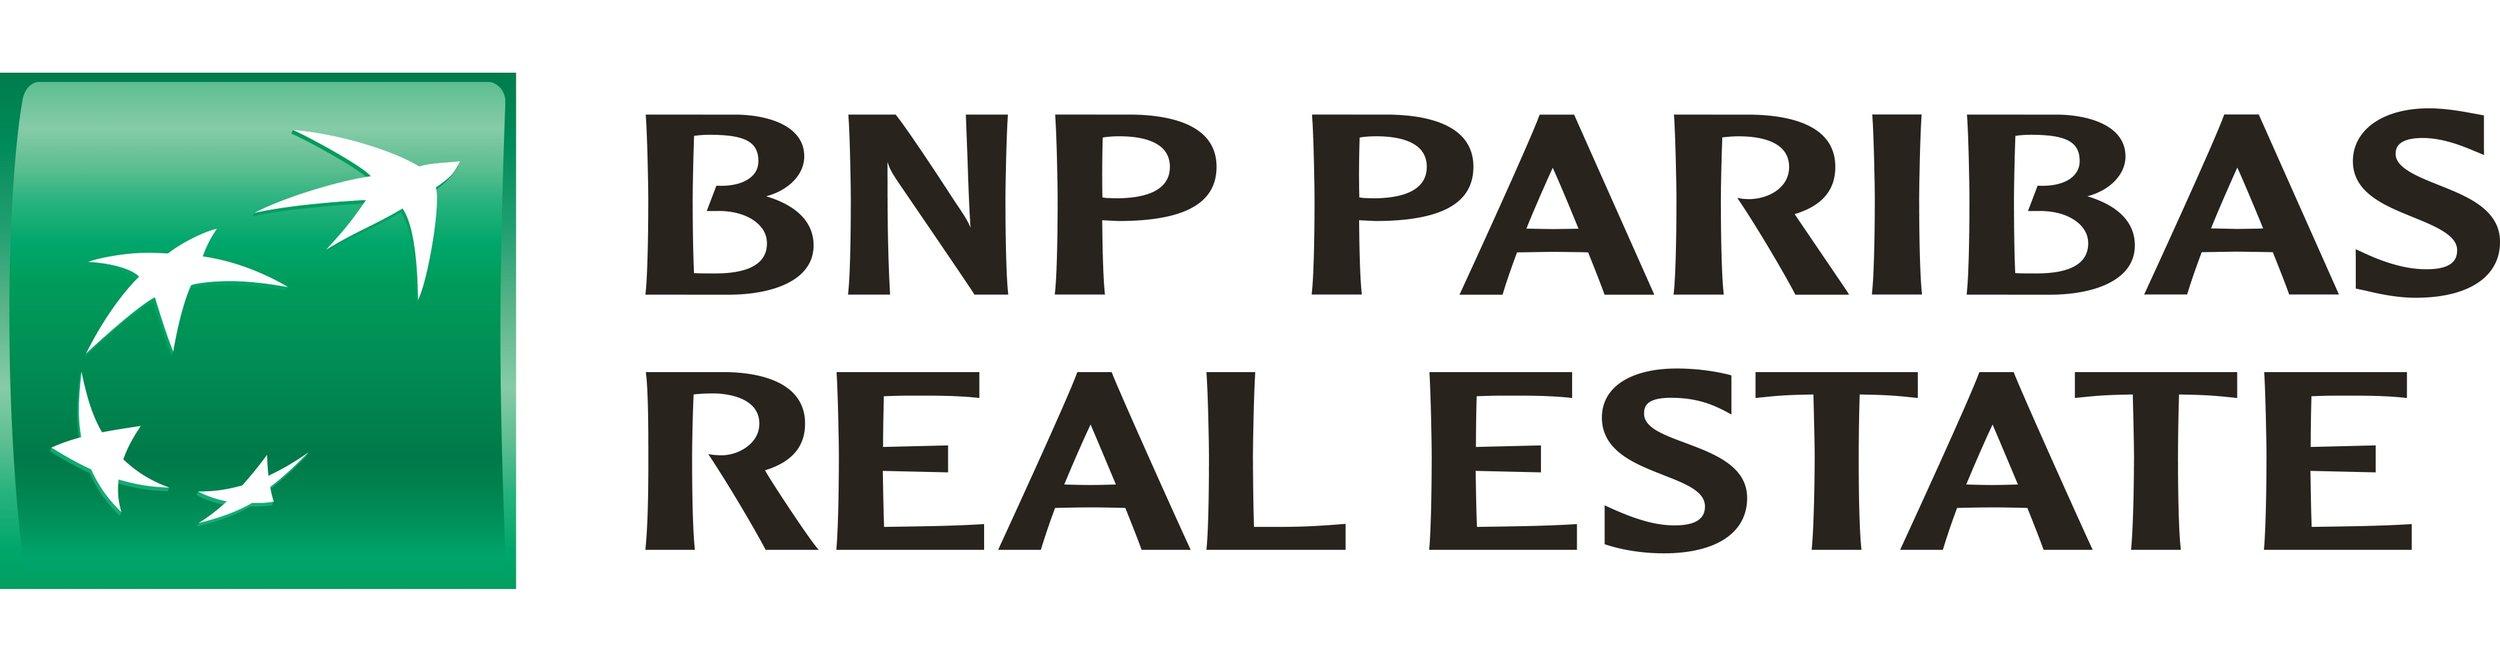 BNP-Paribas-Real-Estate-HiRes-1.jpg